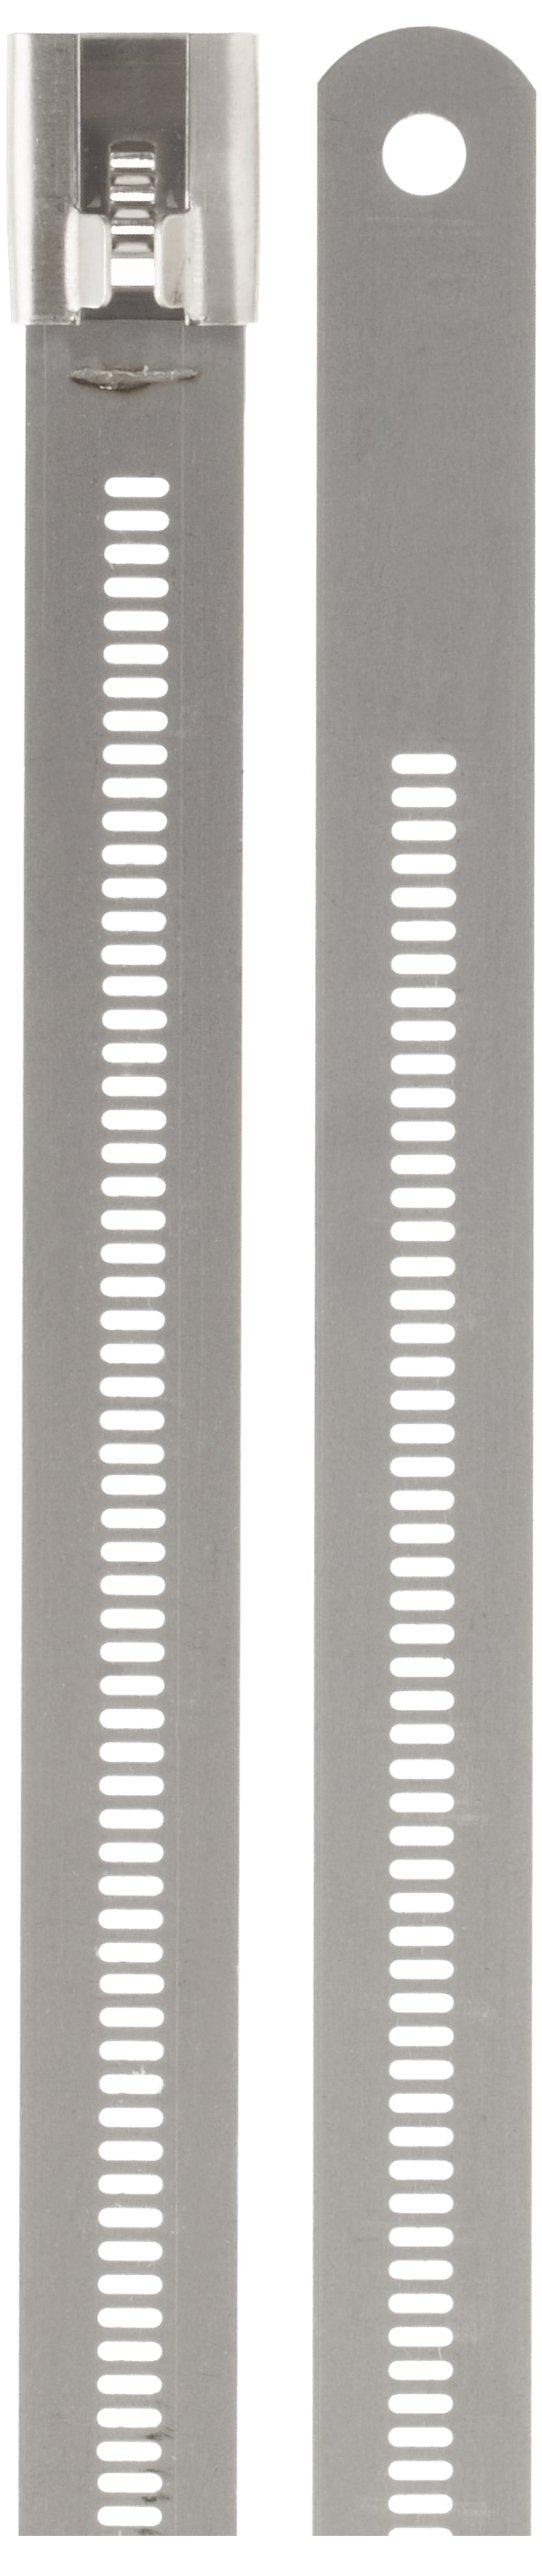 BAND-IT AE7019 316 Stainless Steel Multi Lok Cable Tie, 0.47'' Width, 6'' Length, 1.3'' Maximum Diameter, Bag of 100